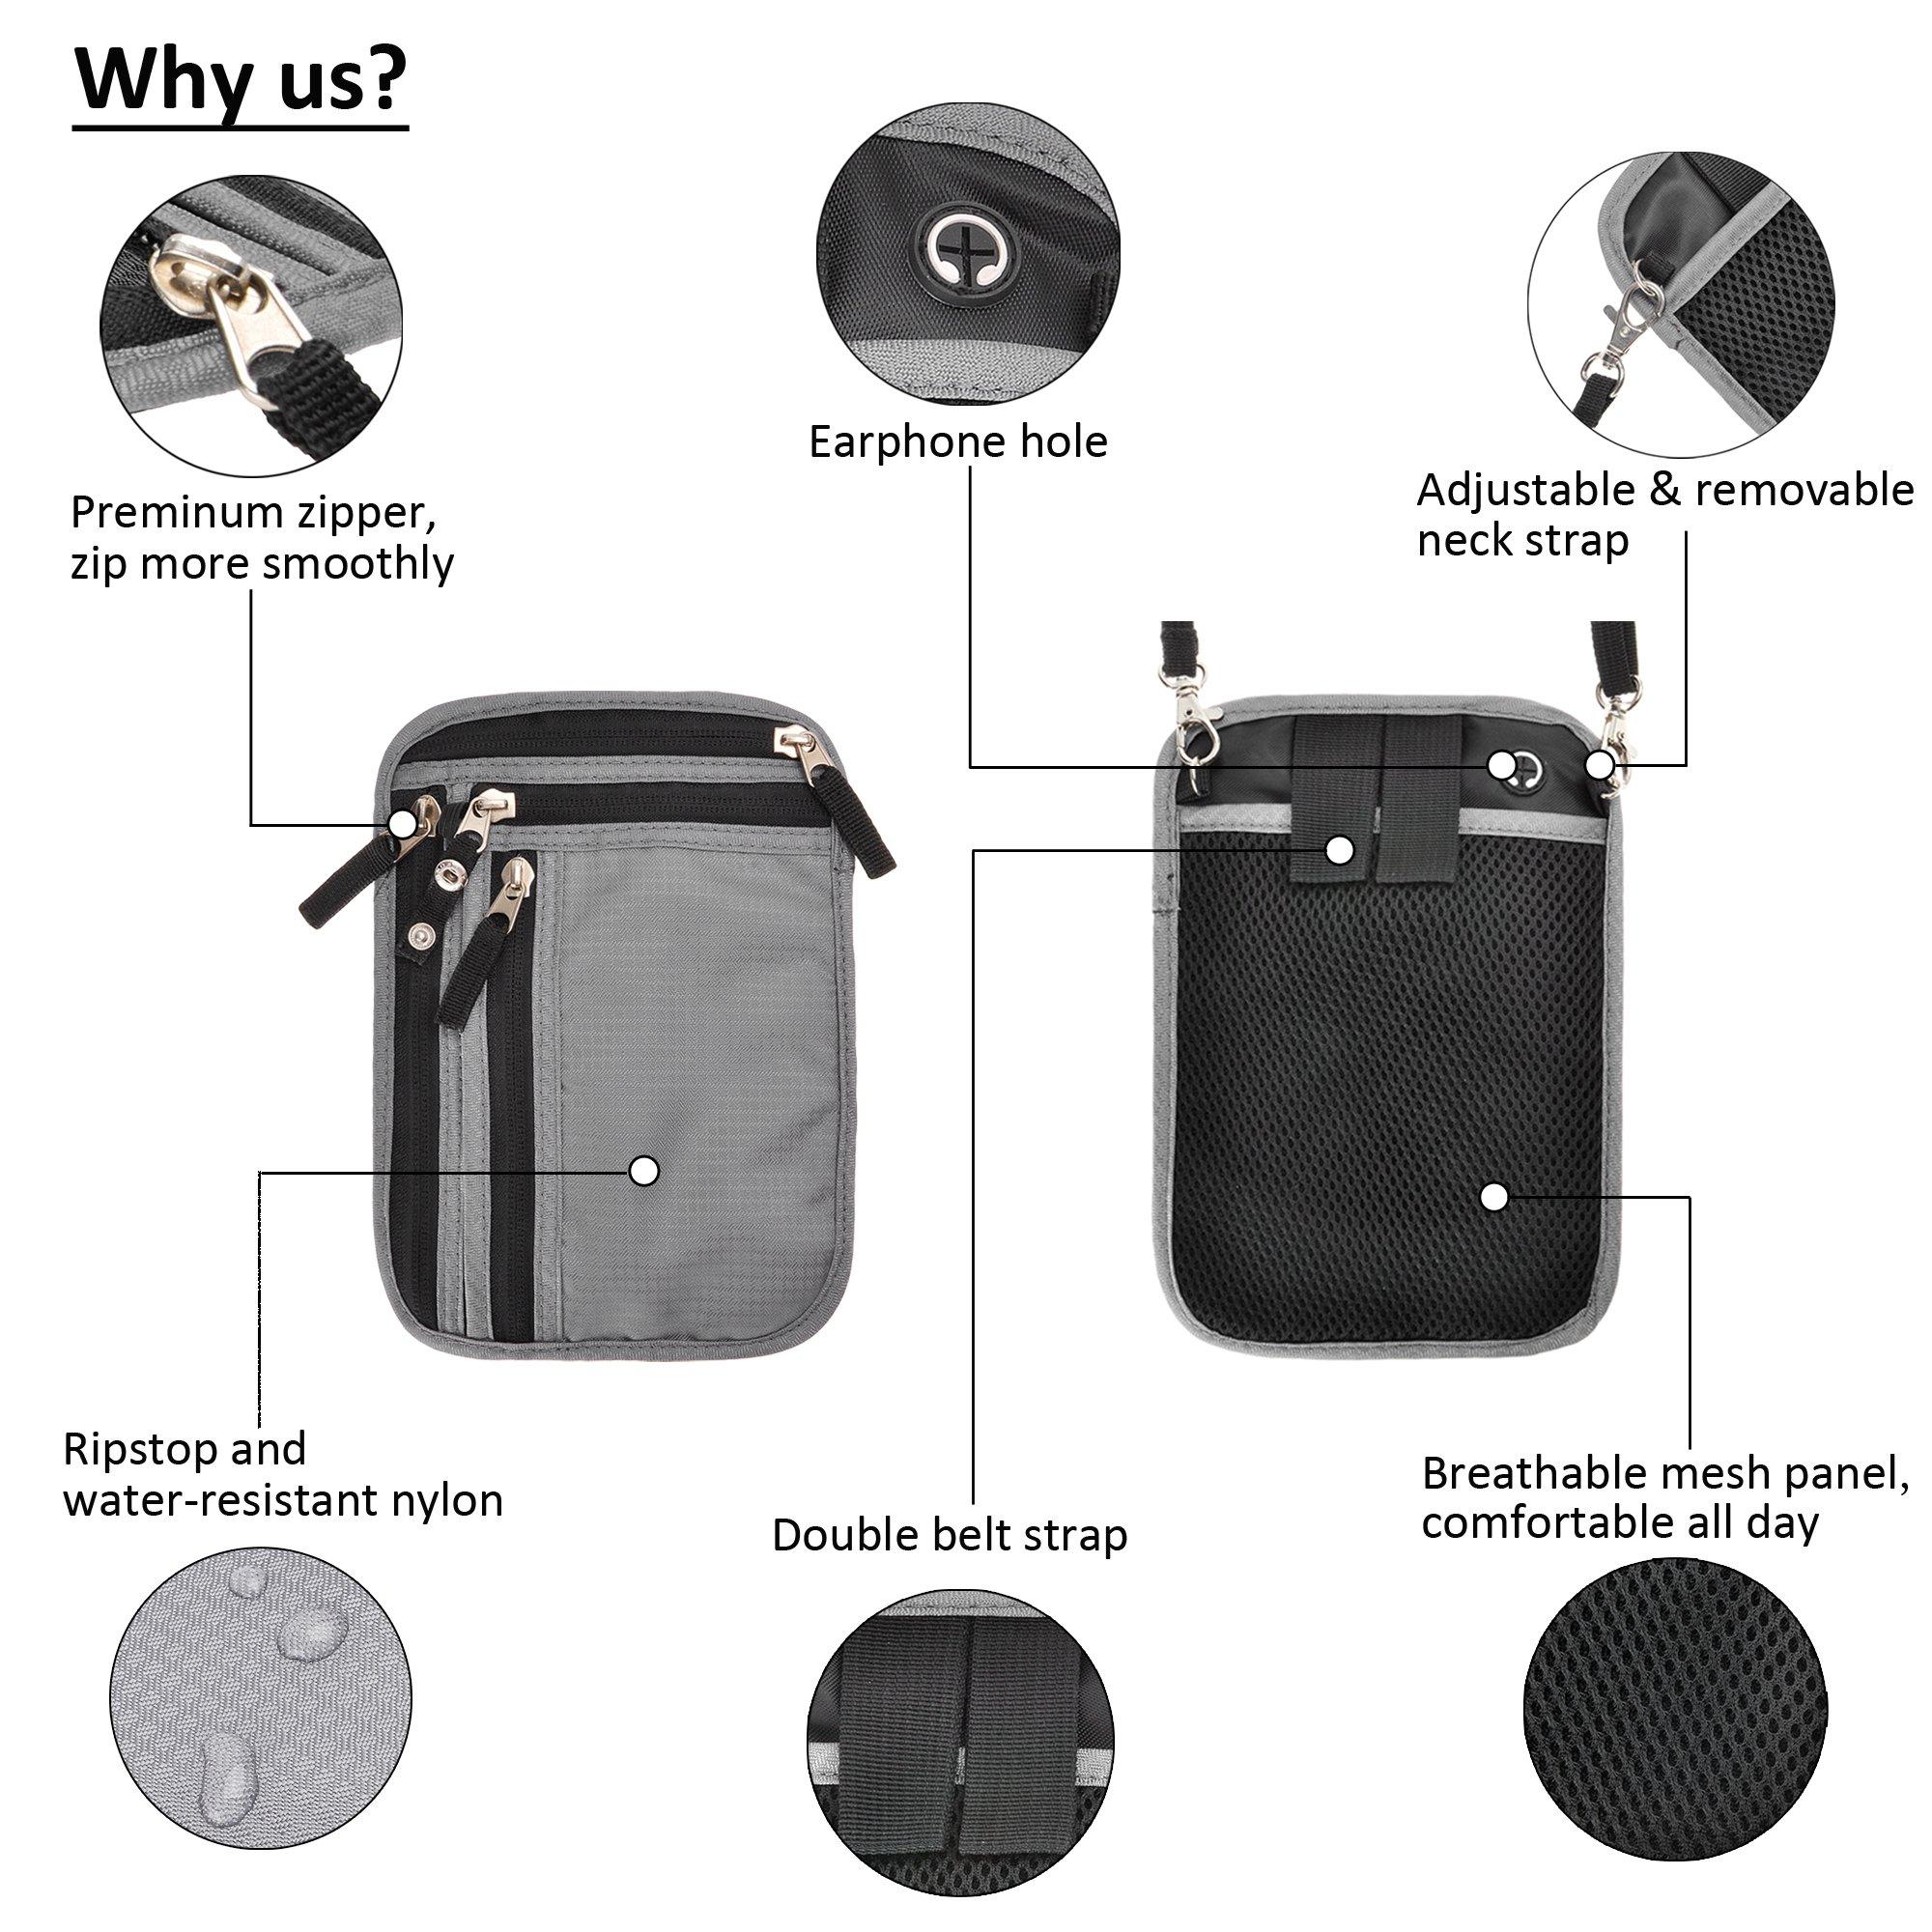 RFID Blocking 2-in-1 Travel Neck Stash and Belt Wallet Security Hidden Passport Holder Pouch by ZLYC (Image #5)